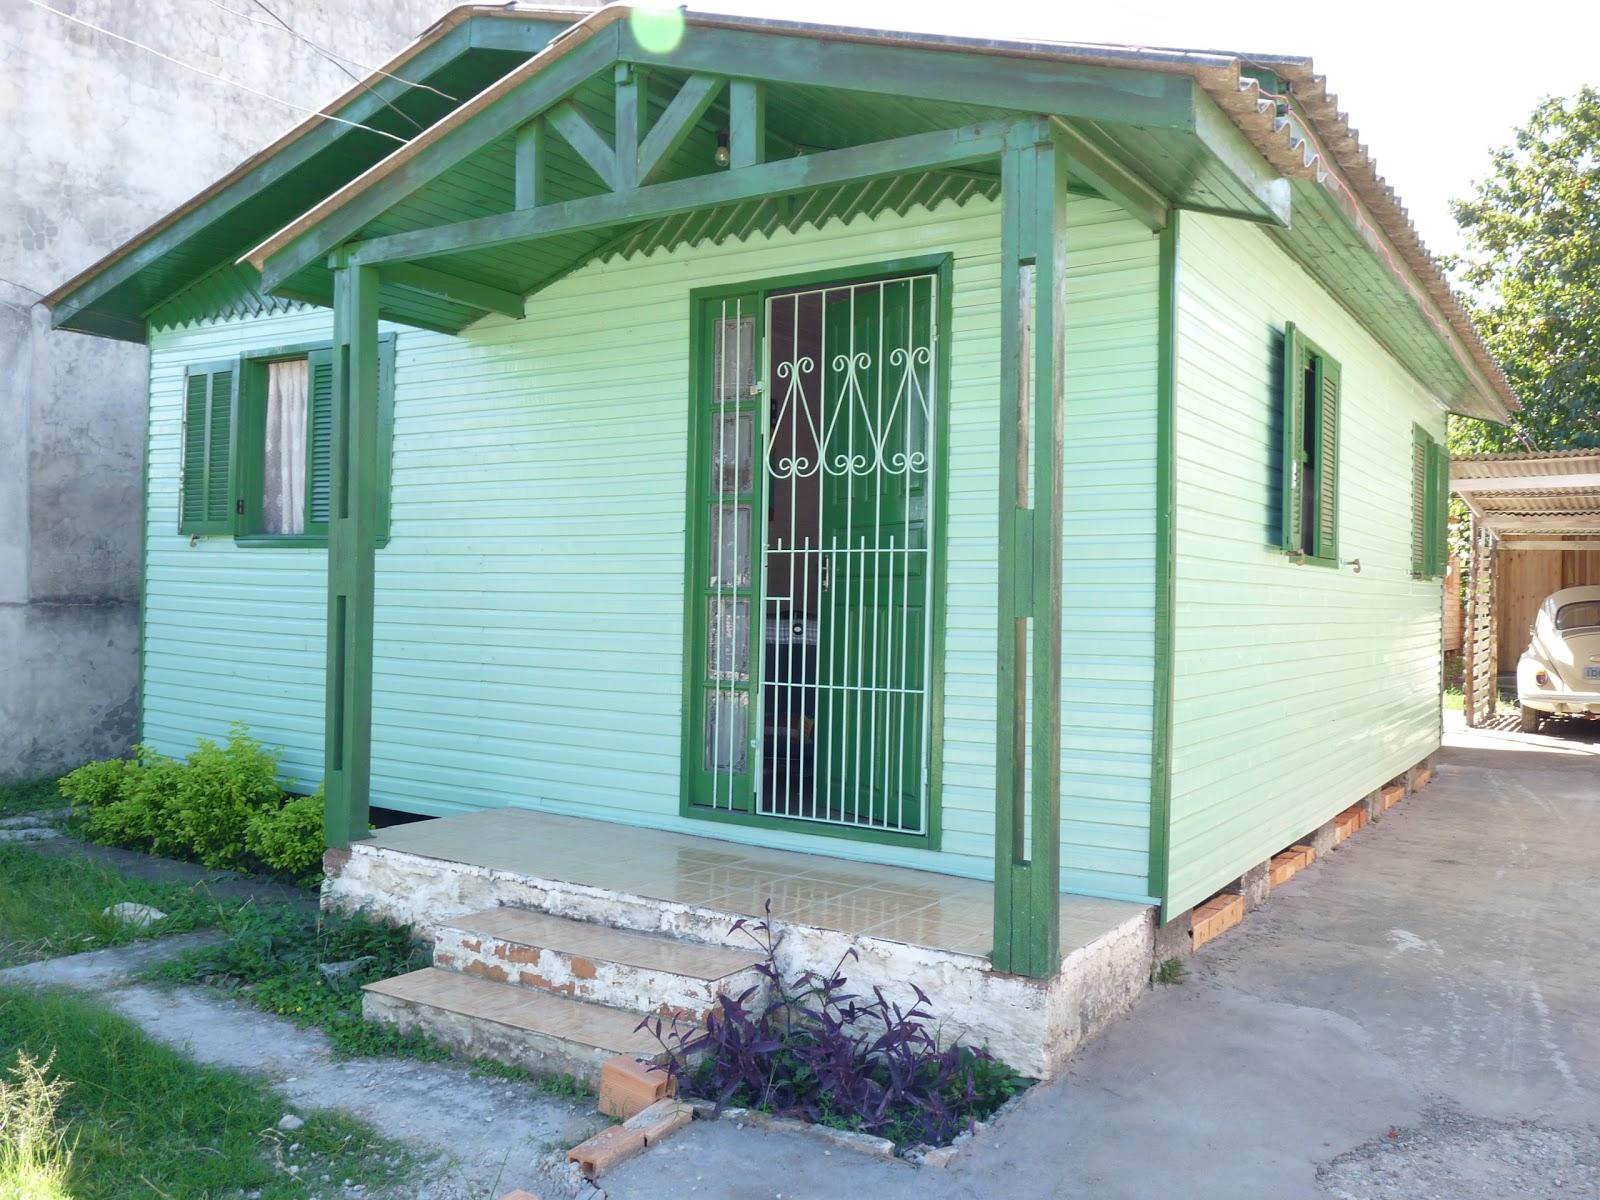 Amell imoveis construir reformar decorar modelos de - Casas baratas para reformar ...